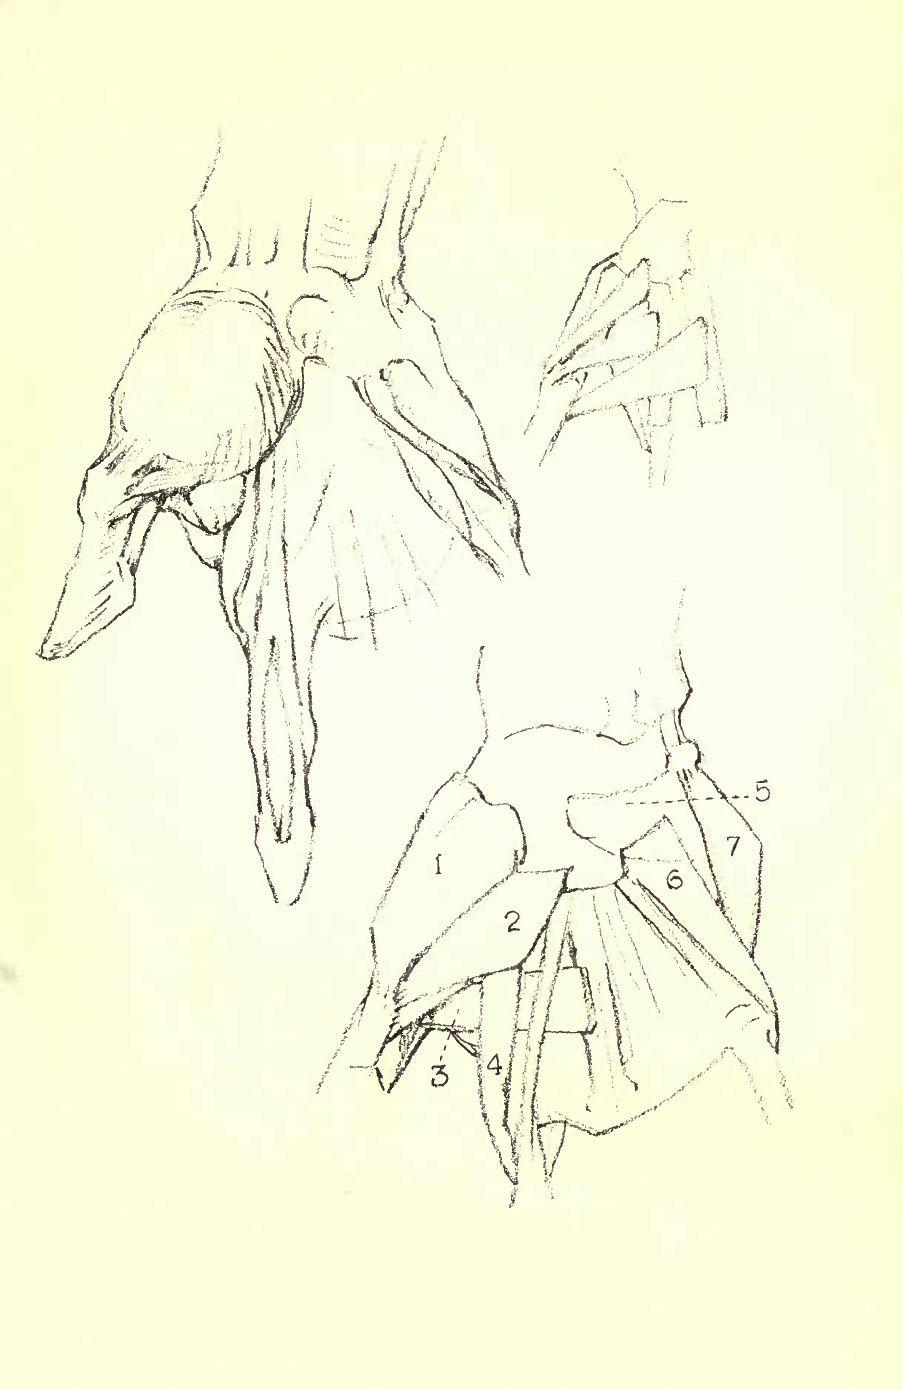 Constructive Anatomy by George Bridgman | Scribd | George Bridgman ...